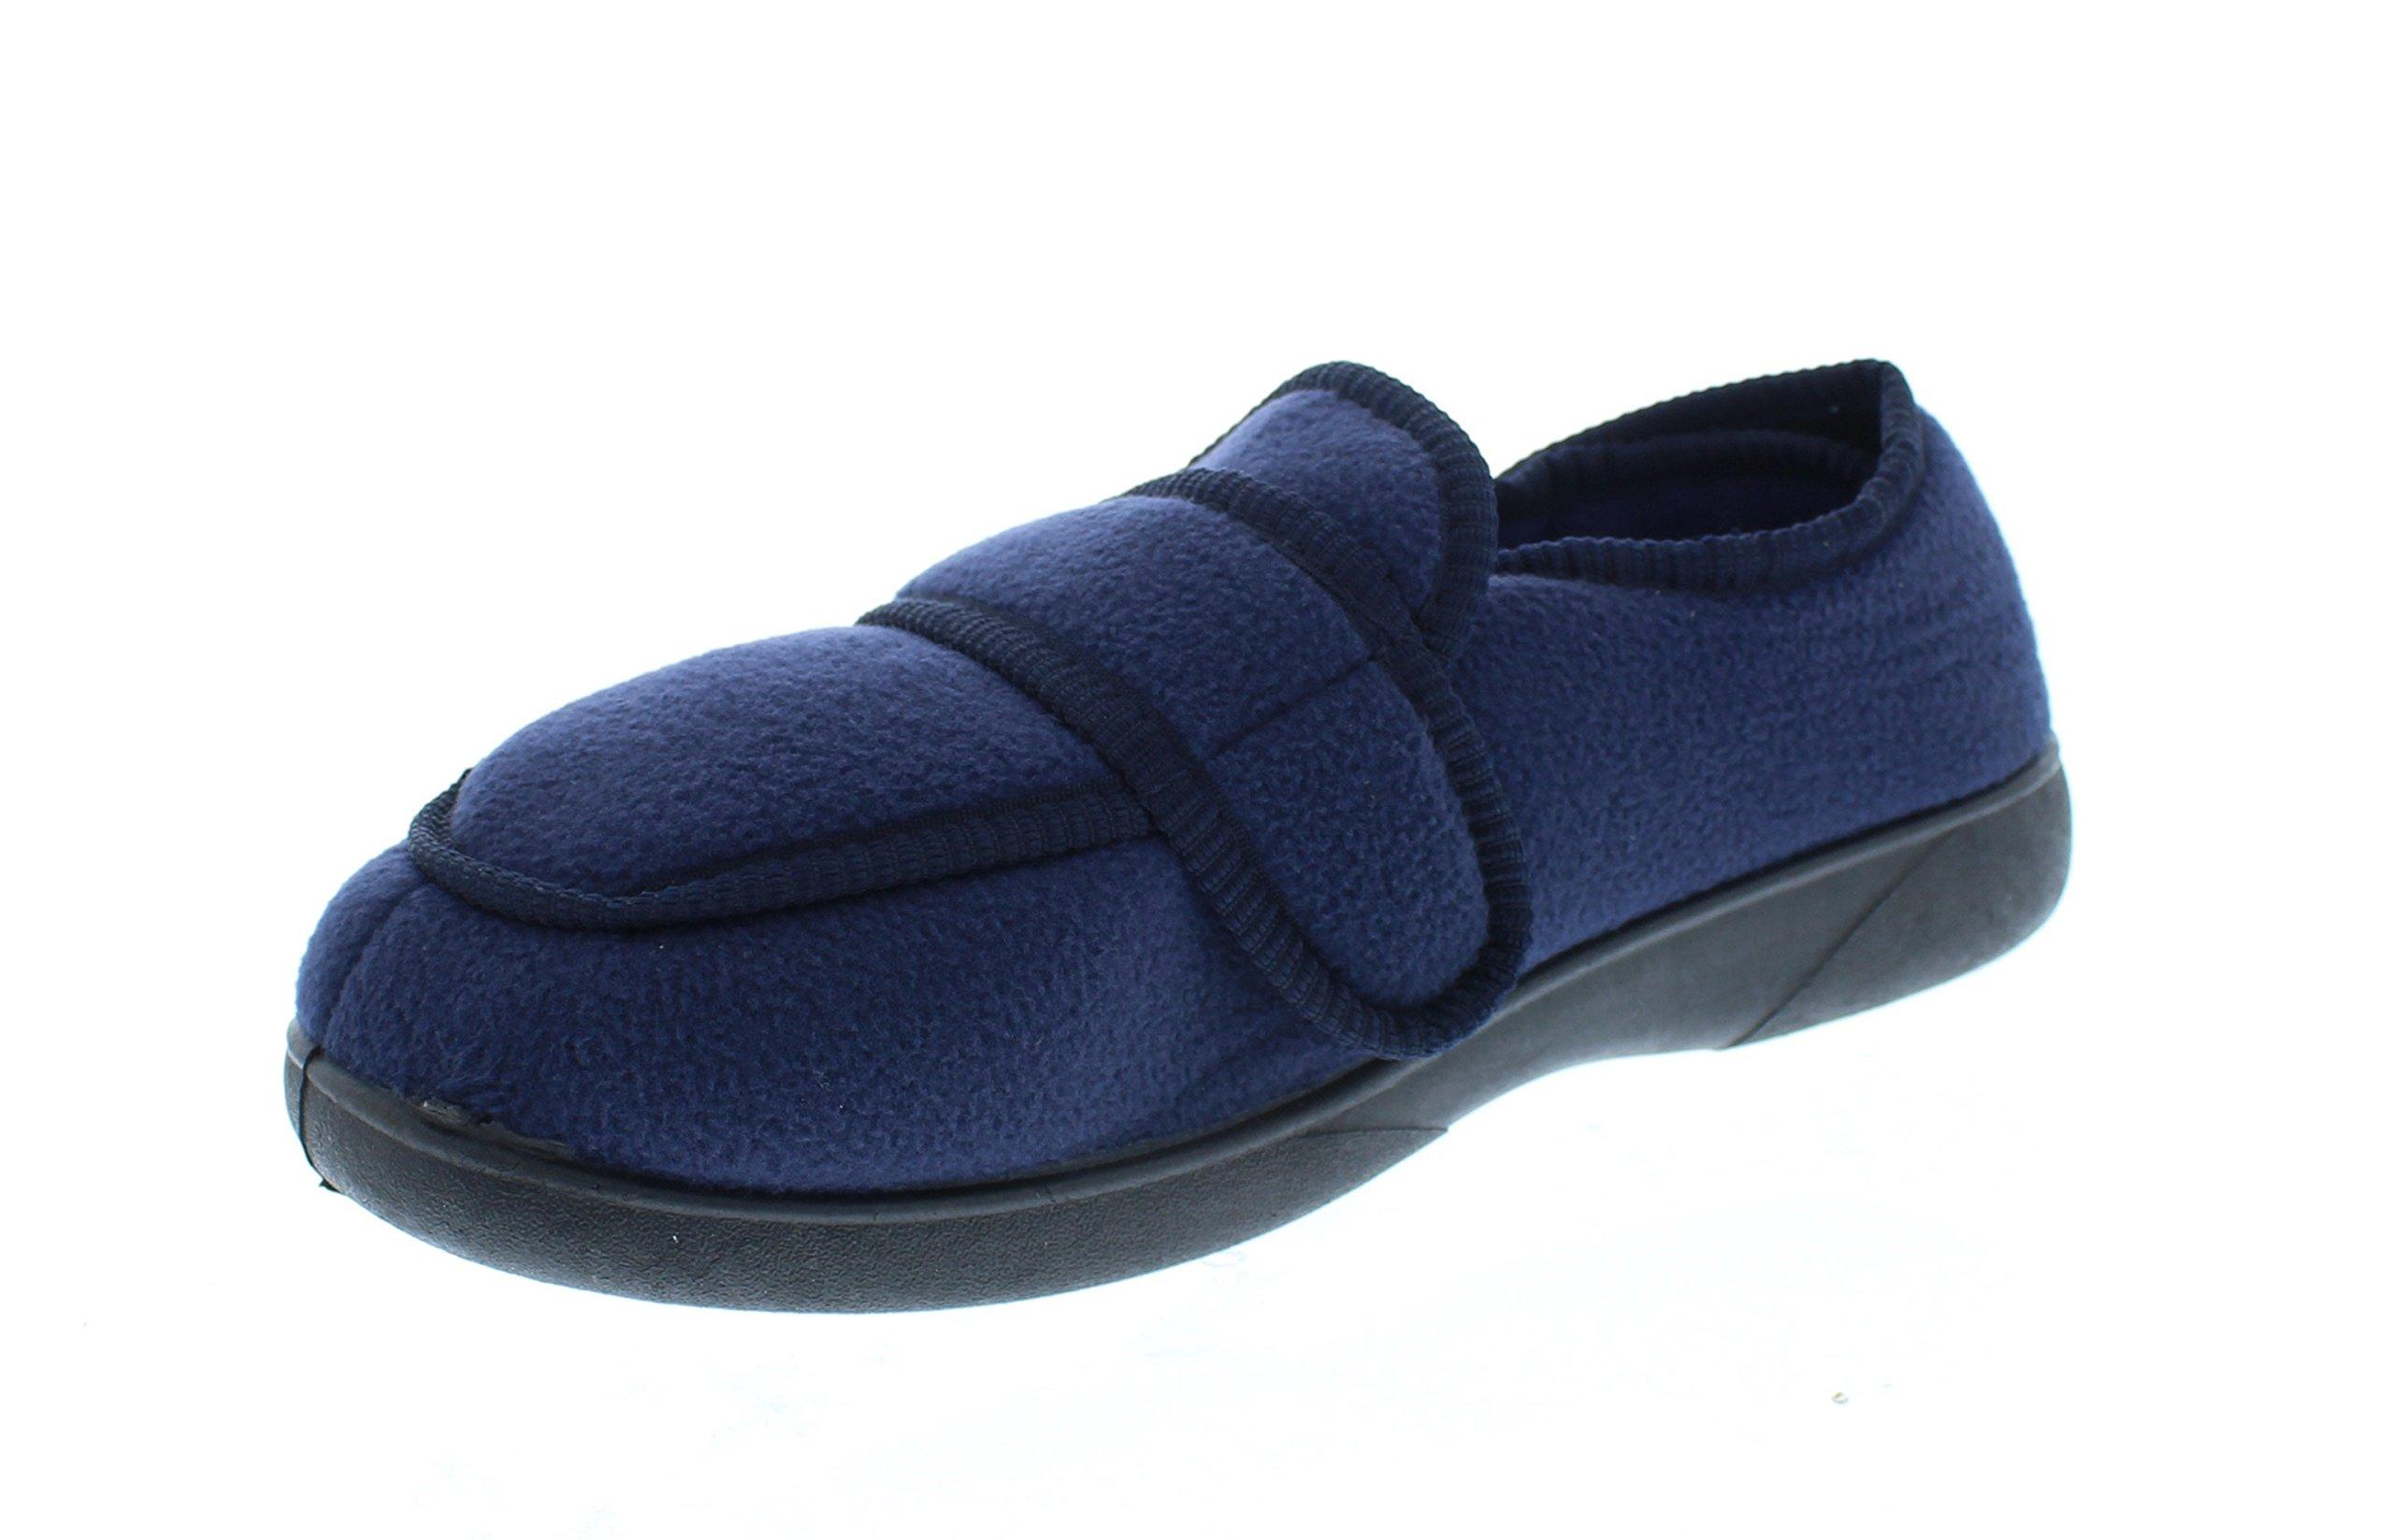 Gold Toe Jude Mens House Shoes Diabetes,Men's Orthopedic Edema Slipper,Eldery Houseshoes,Diabetic Footwear for Men Navy 10W